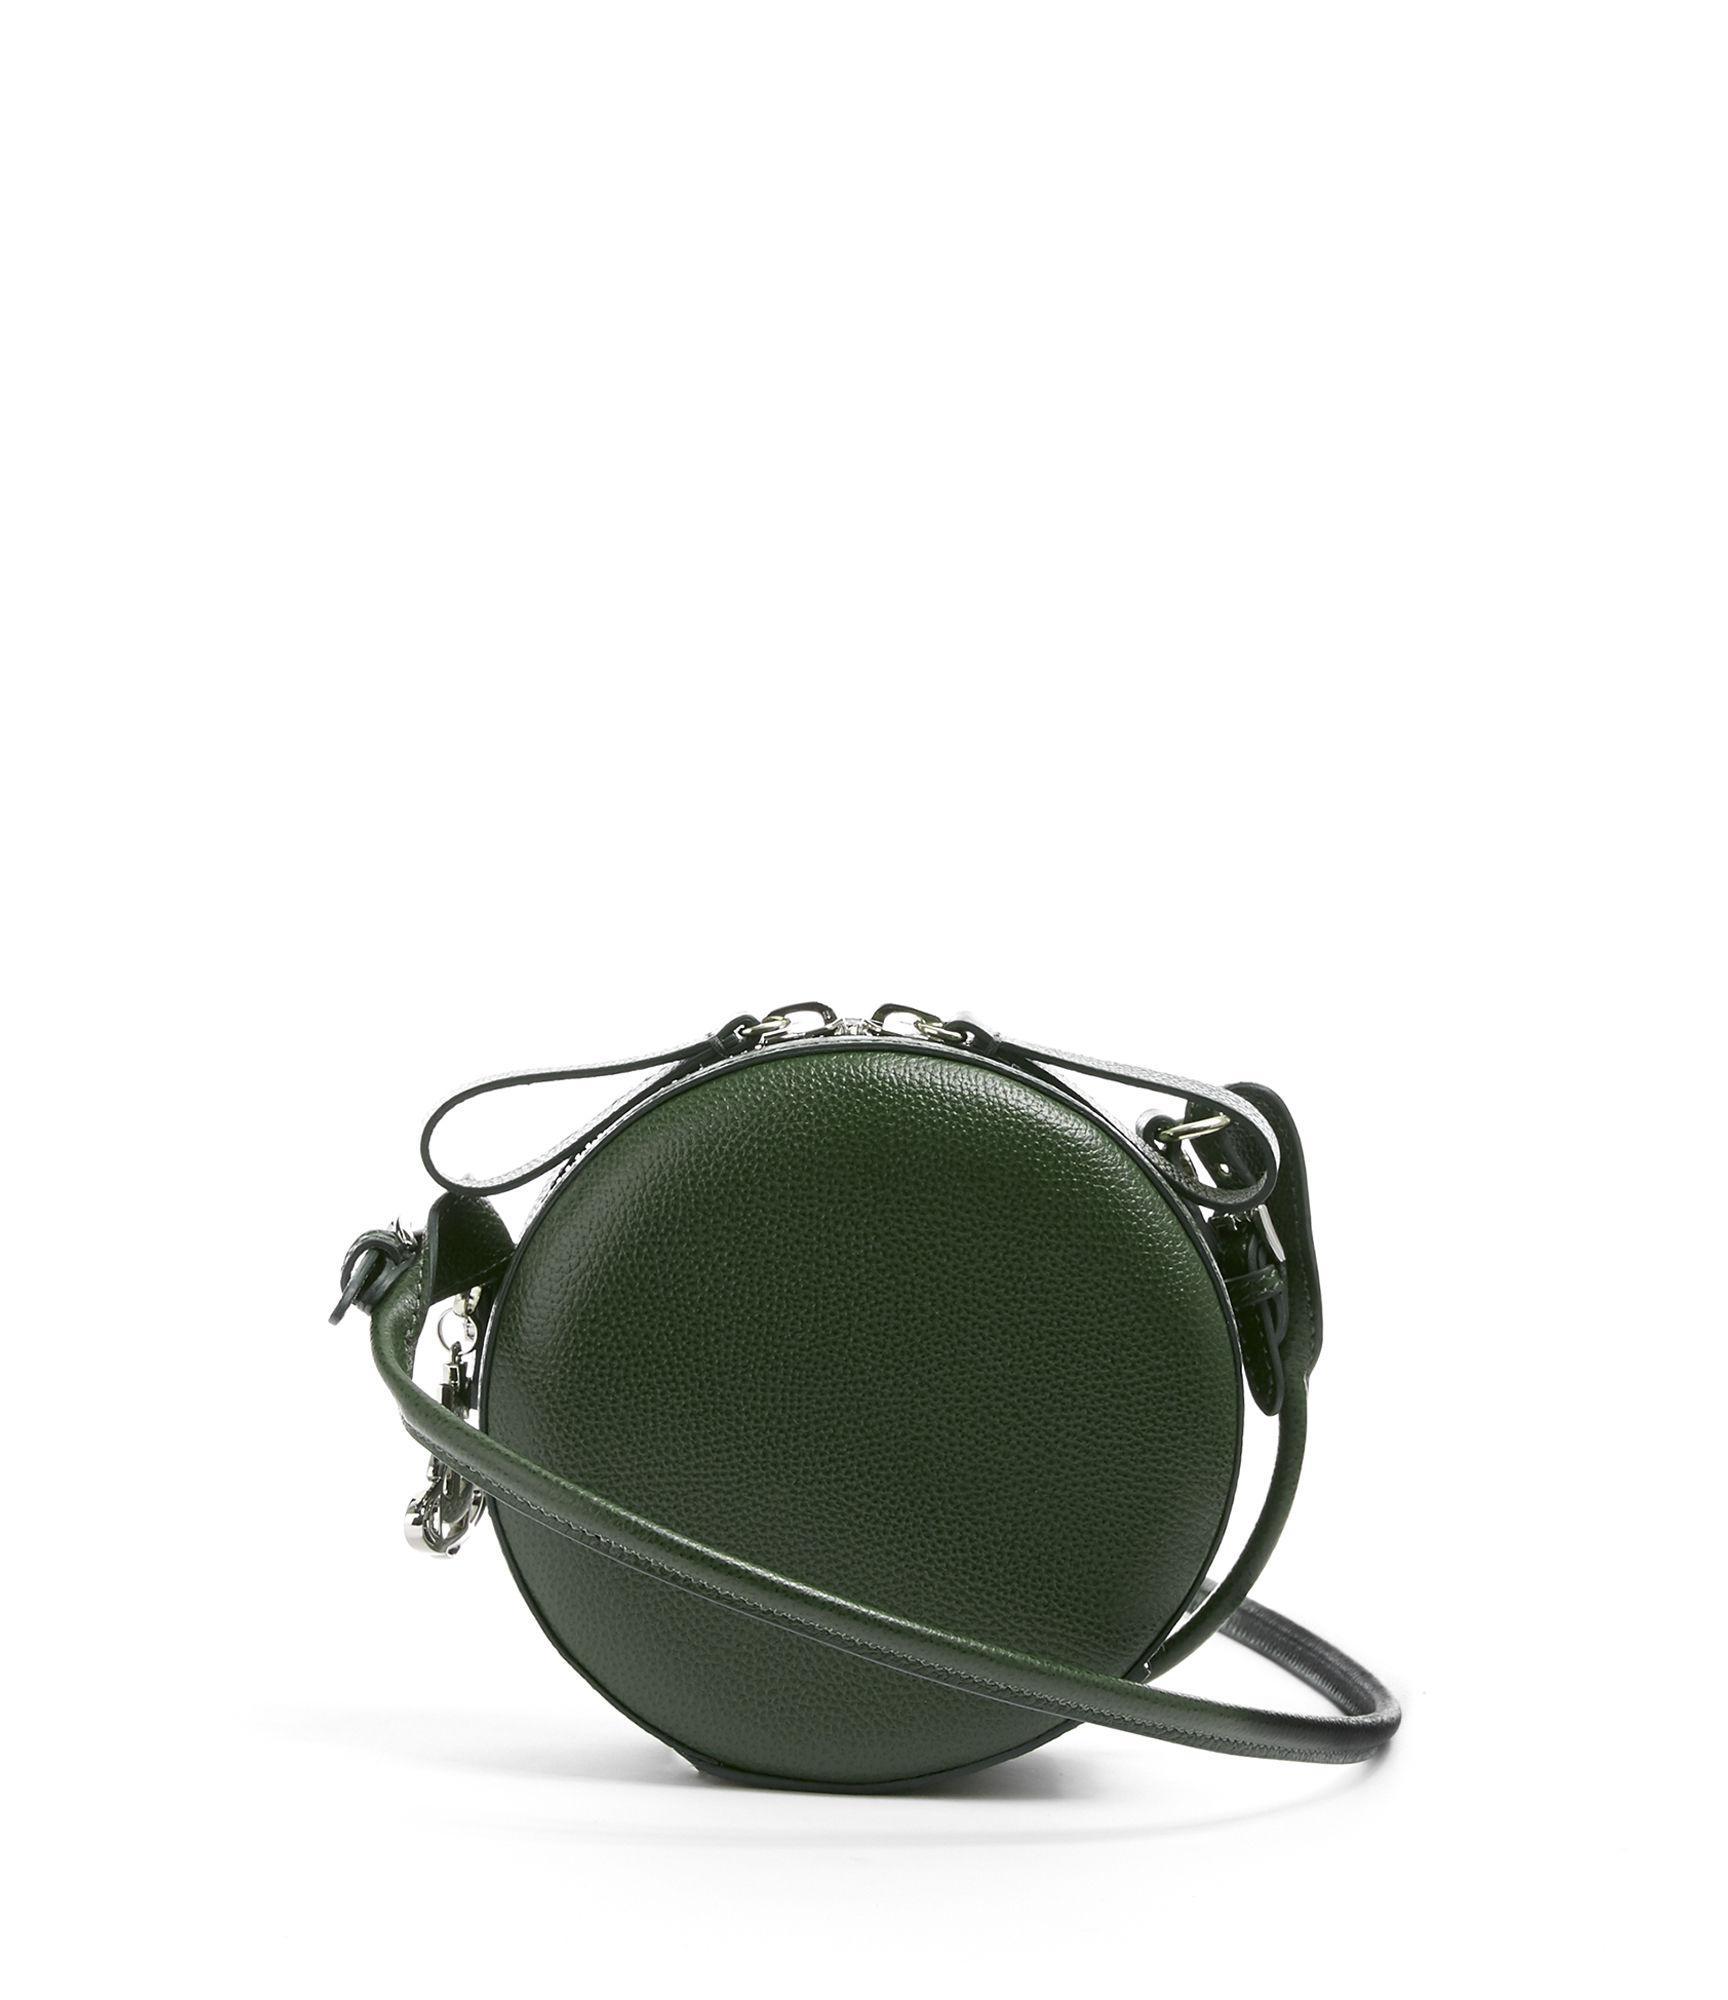 7e00efc2fb1 Vivienne Westwood Johanna Round Crossbody Bag Green | ModeSens